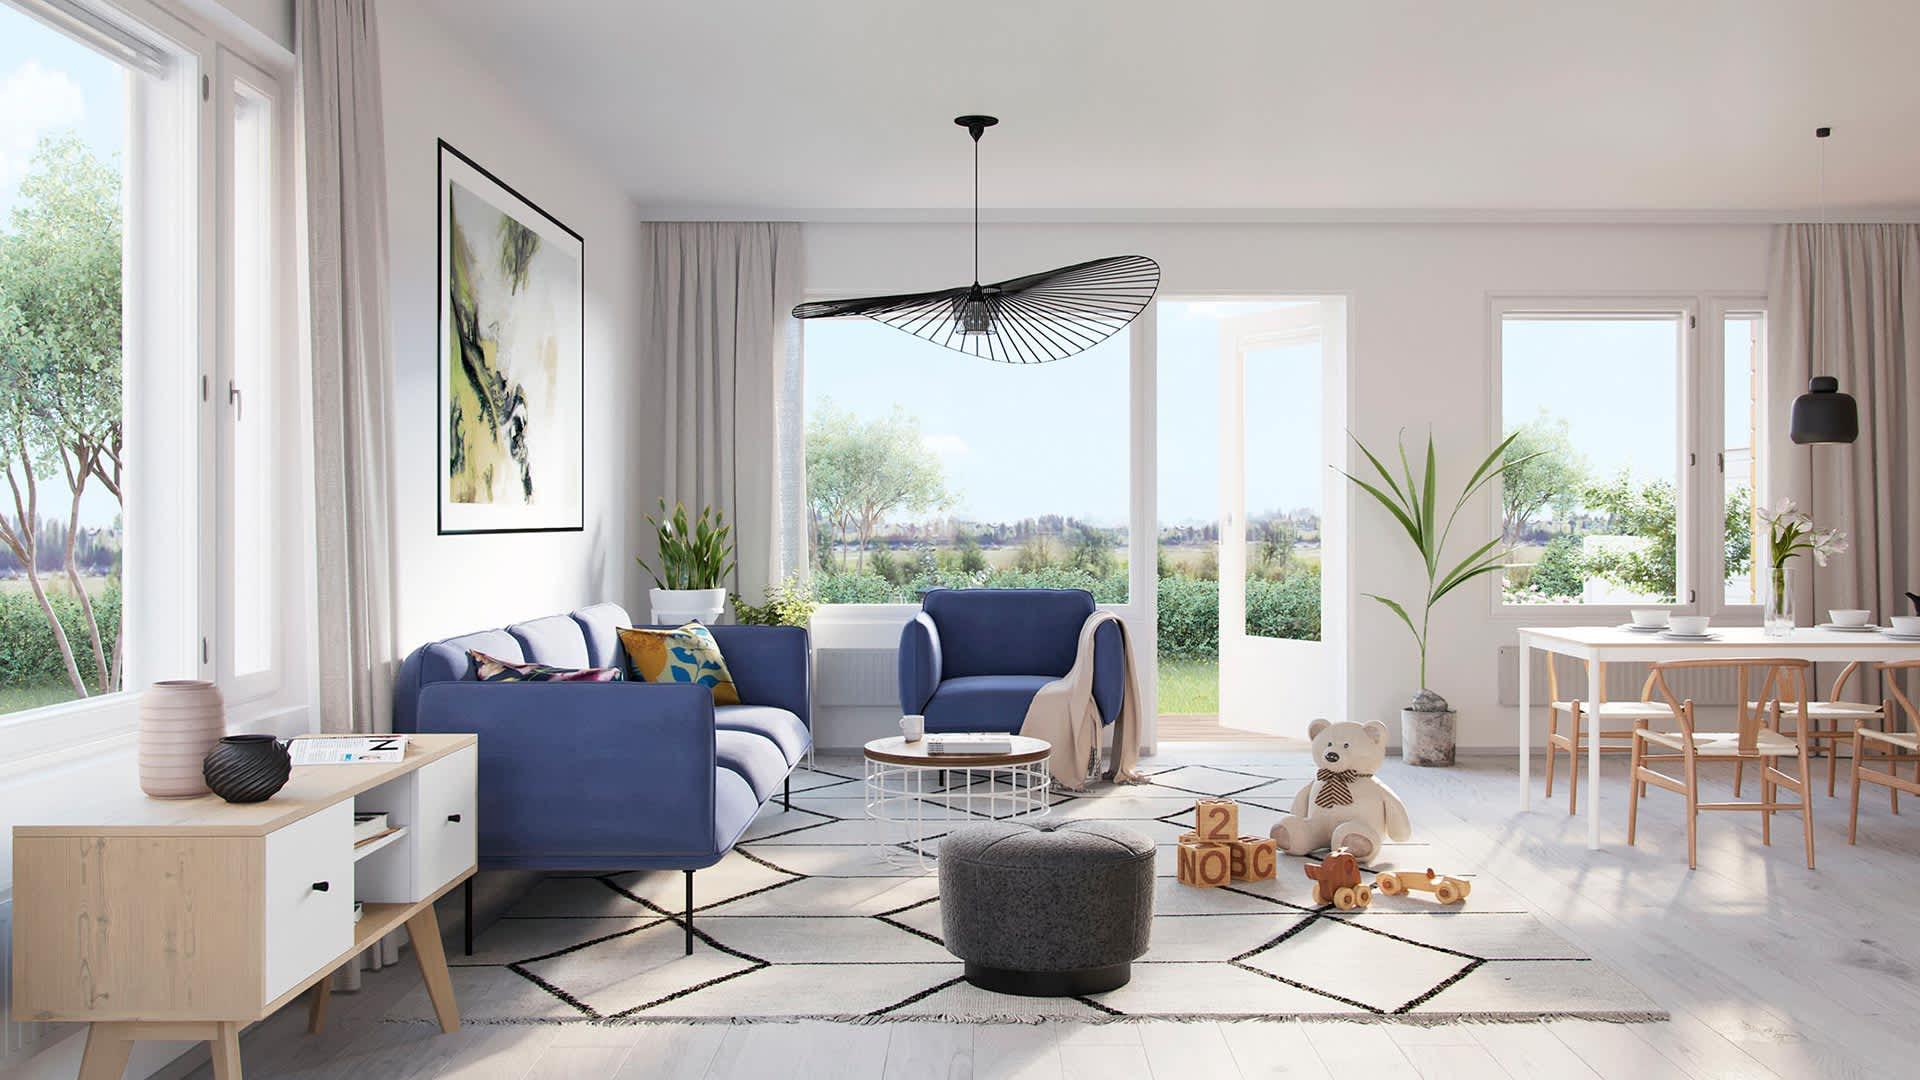 Apartments for sale in Espoo - YIT Koti - Hansavalkama